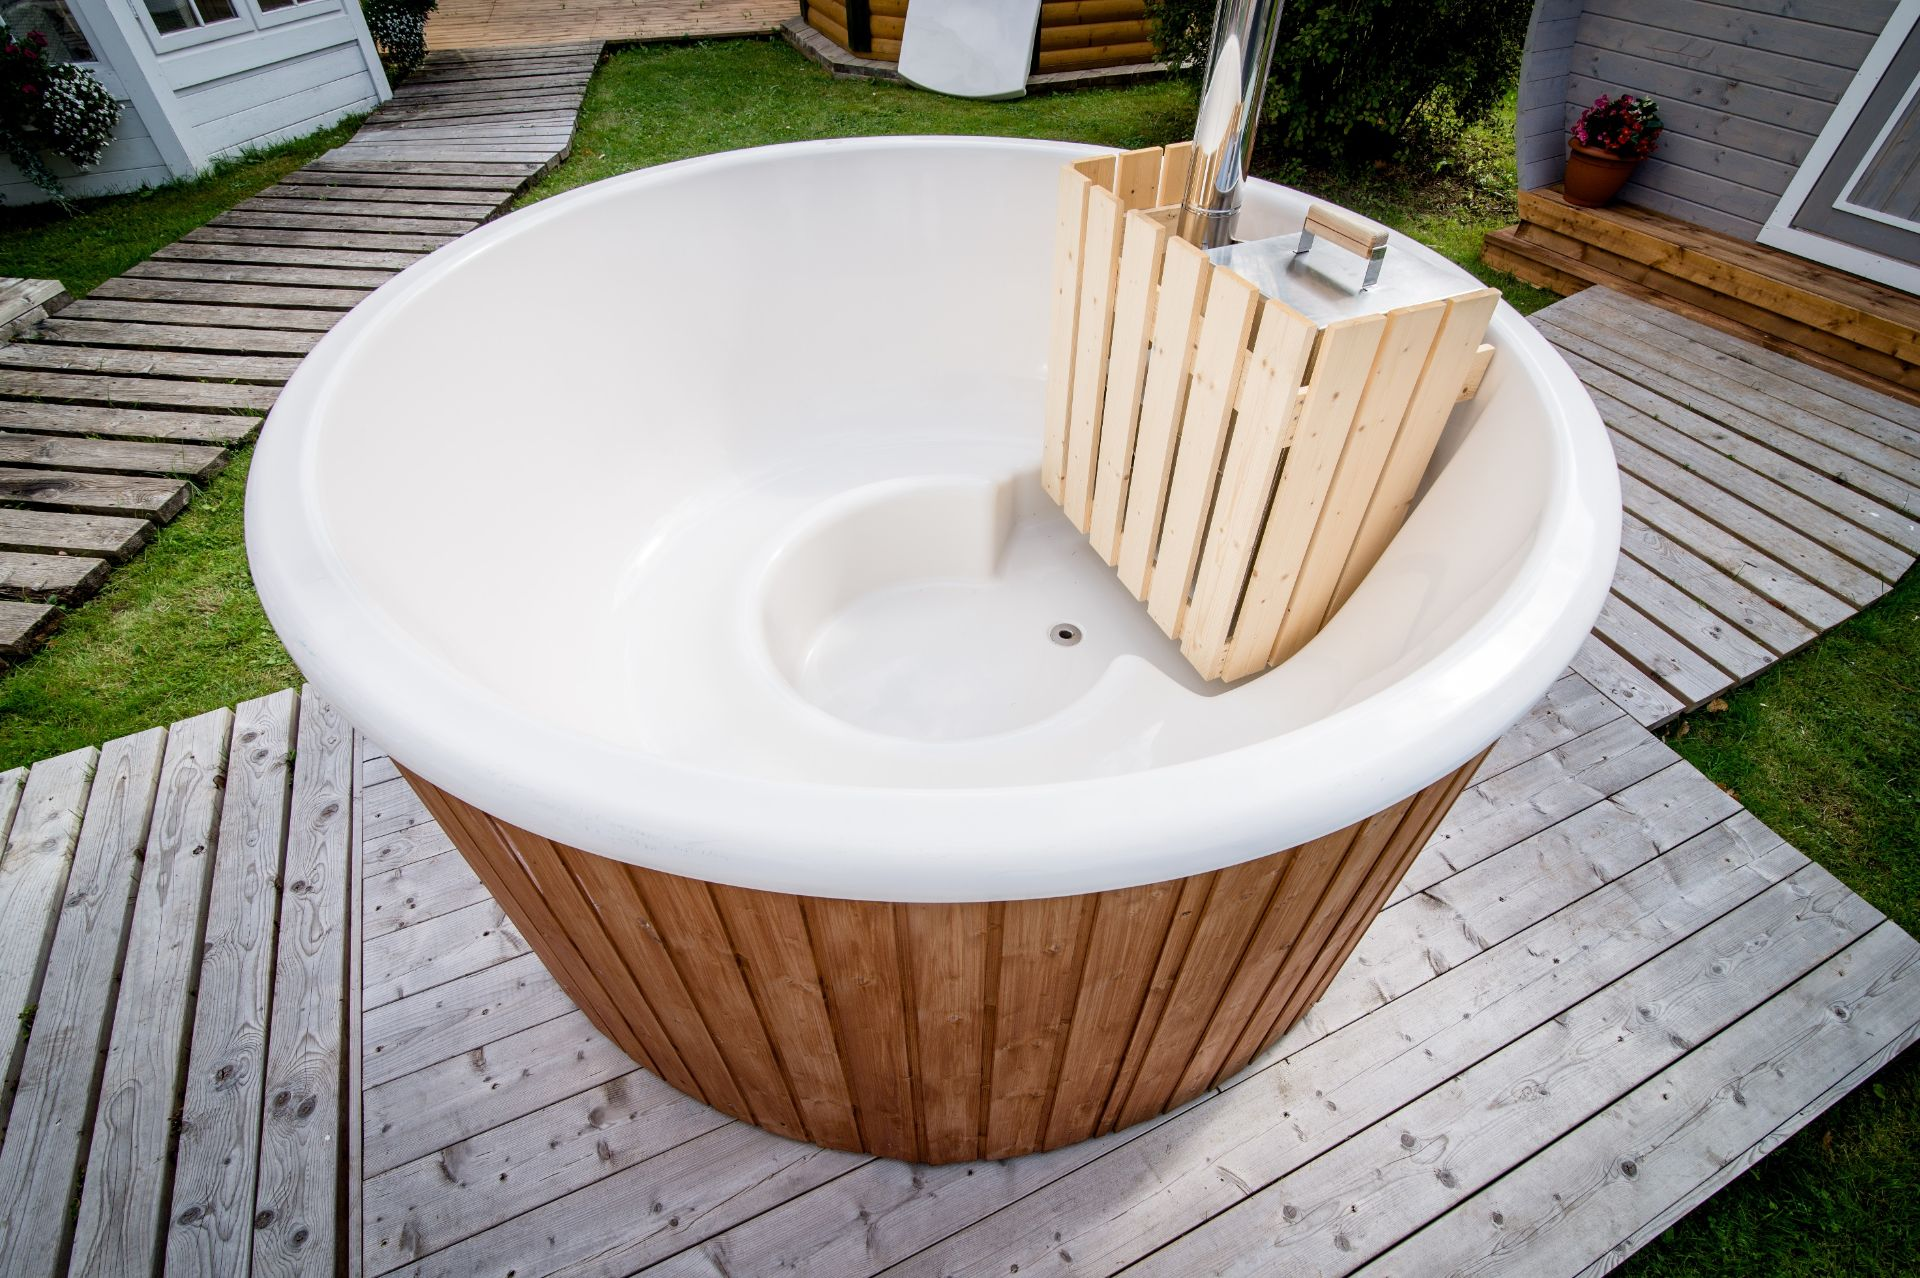 Lot 18002 - V Brand New Fantastic Super Luxury 1.8m Hot Tub With Spruce Finishing - Complete Fiberglass Inside